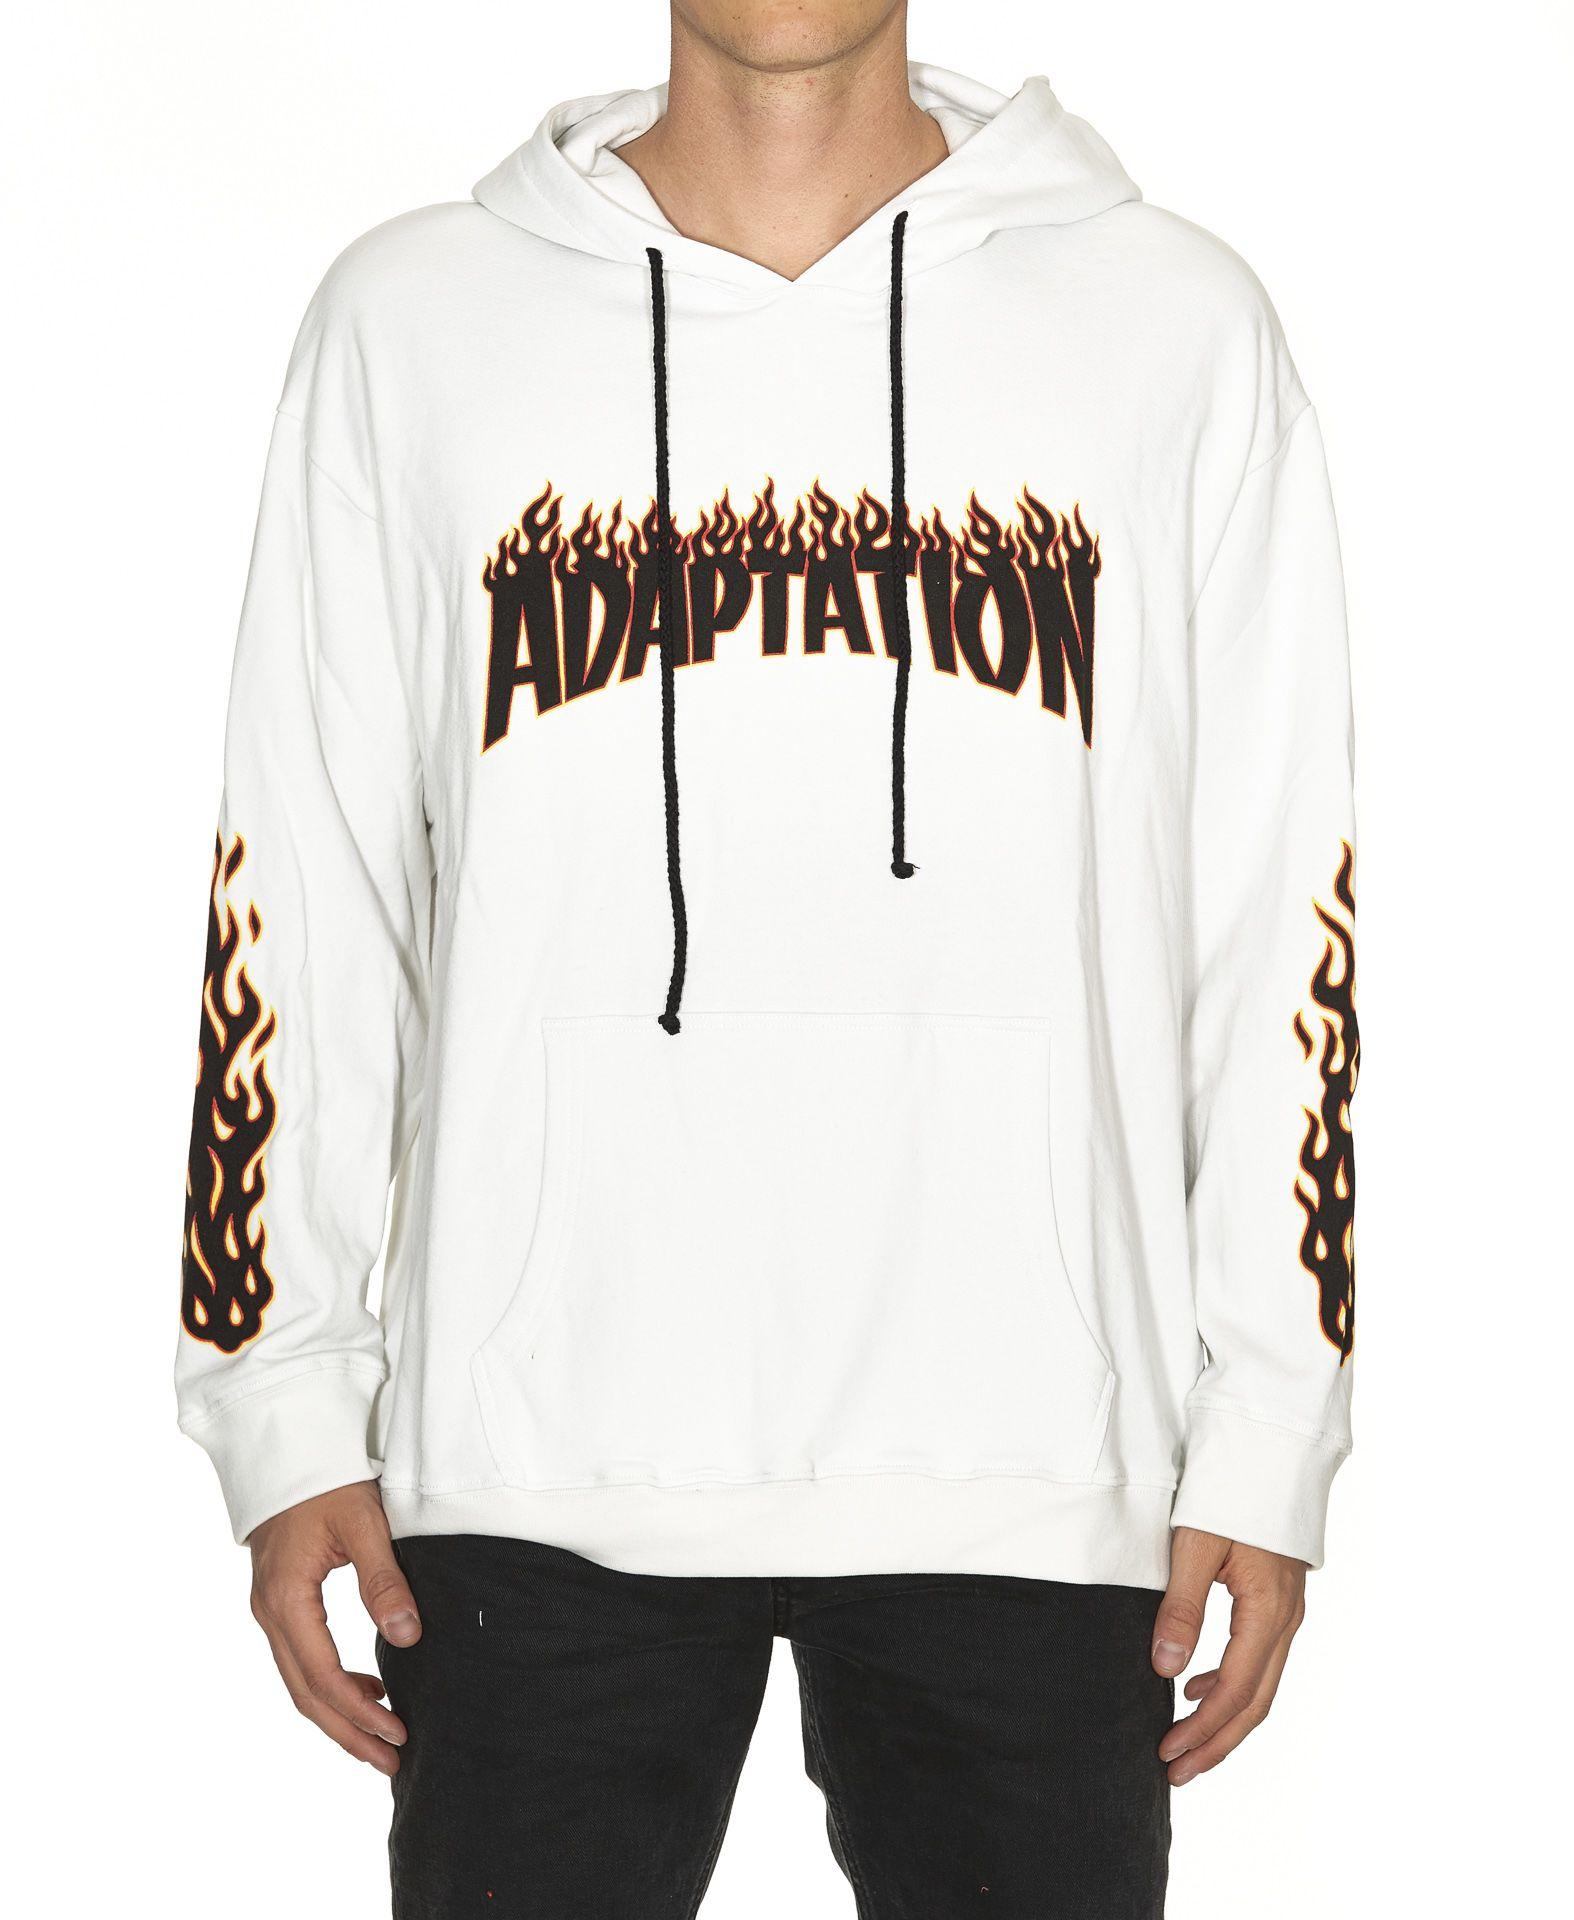 Adaptation Hoodie